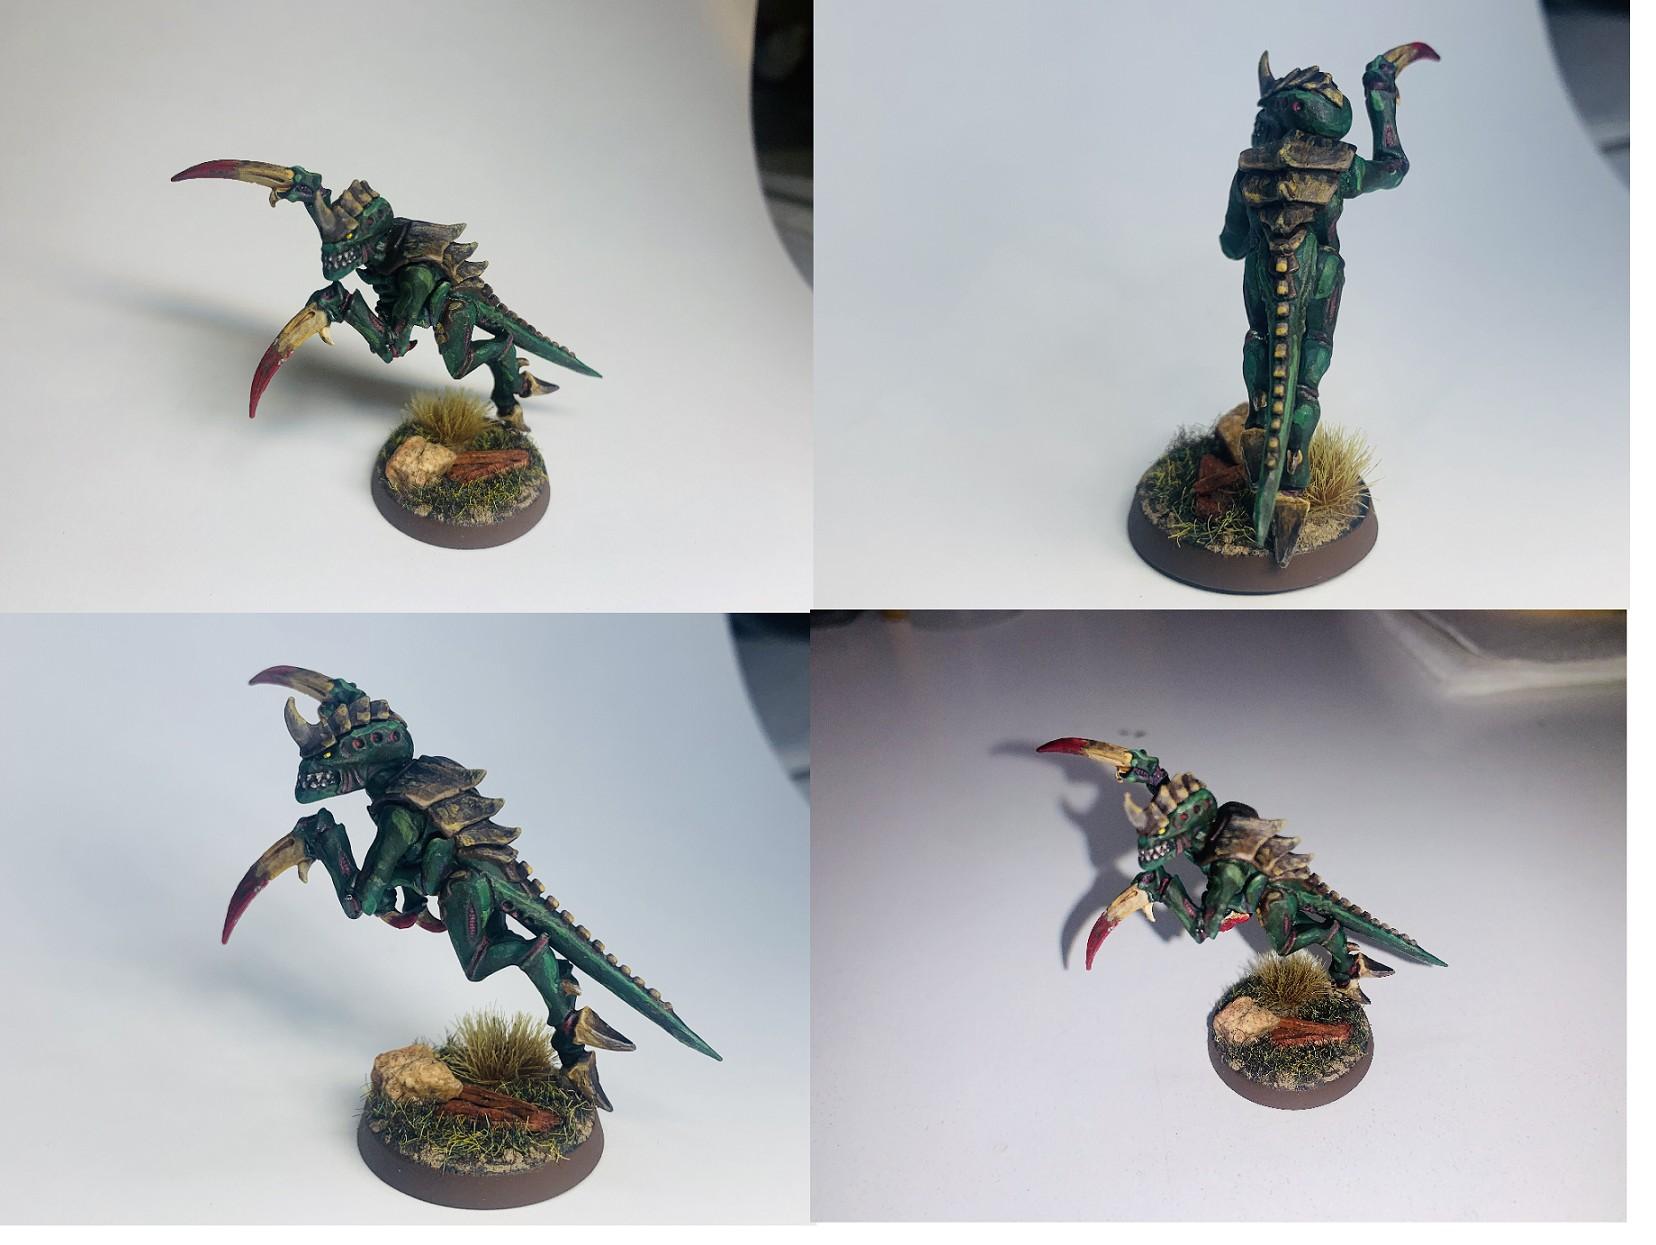 Tyranid Hormagant Green/Brown